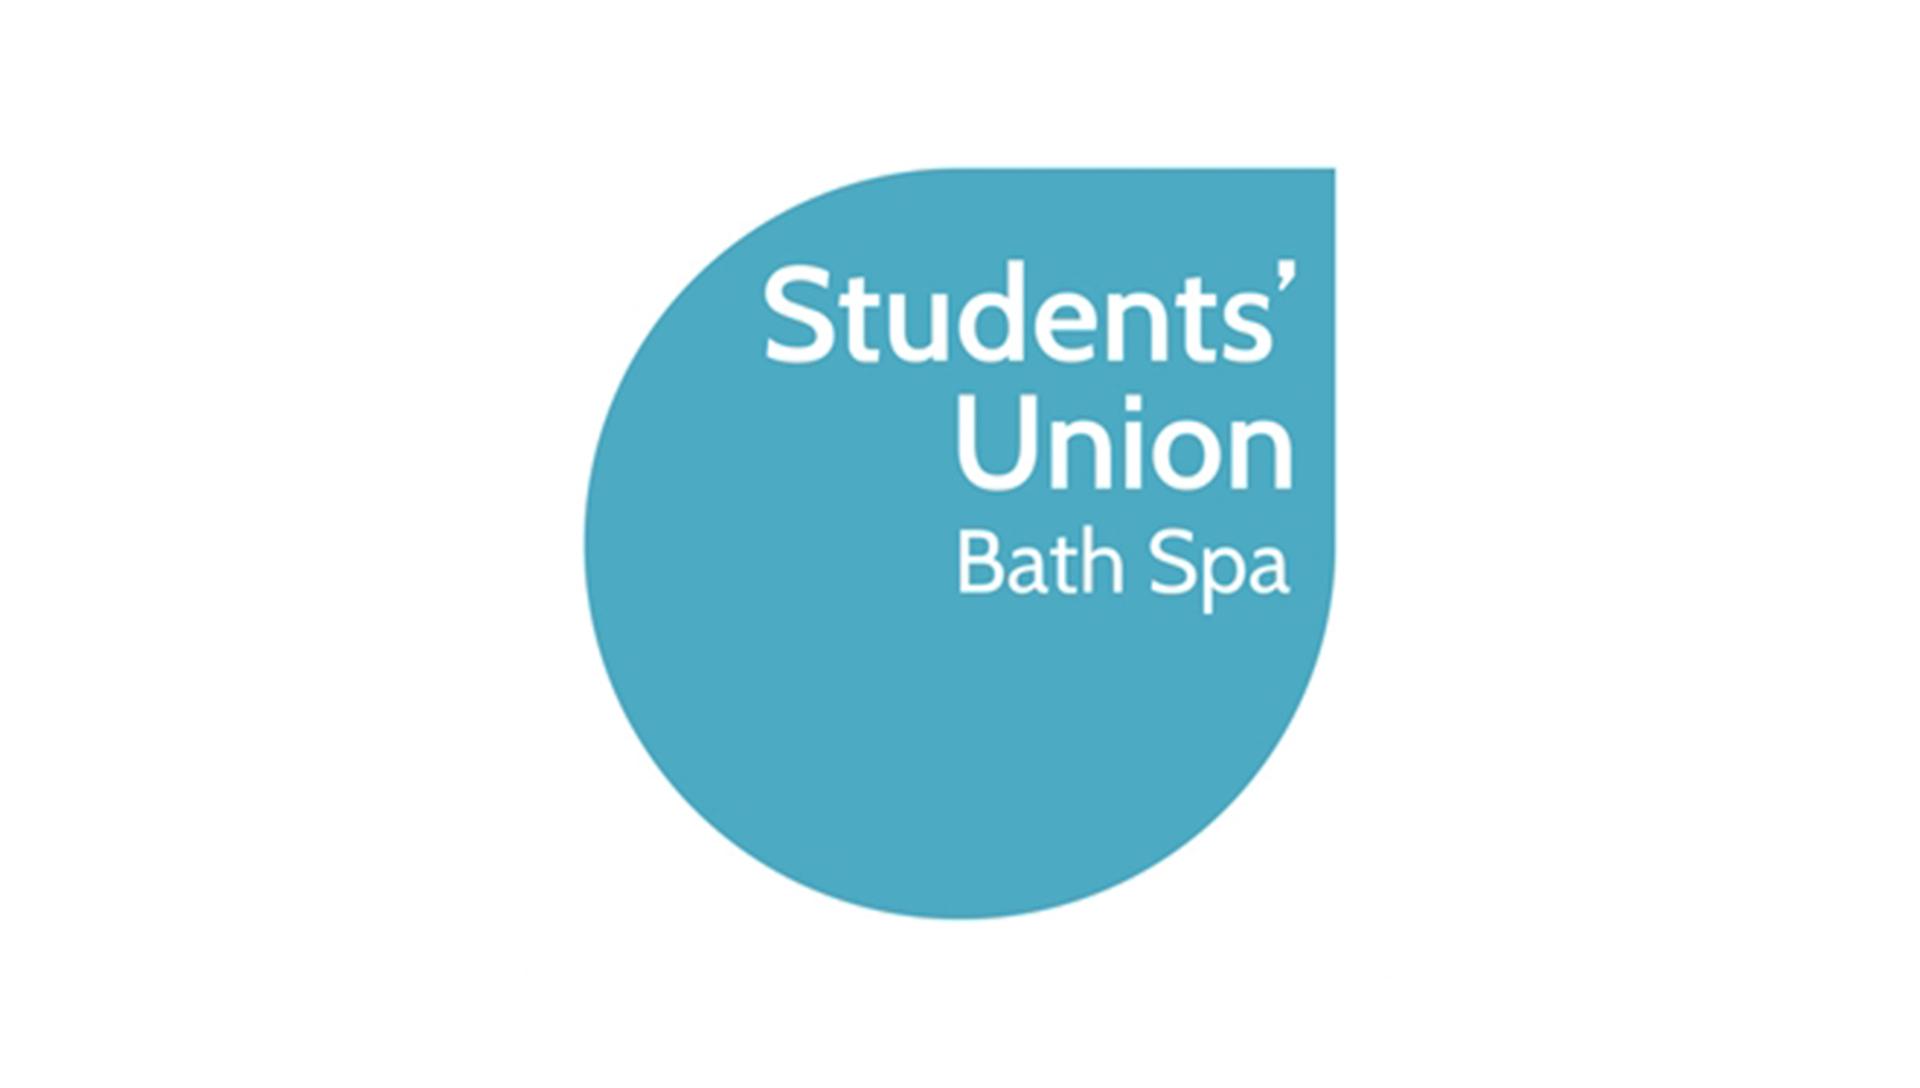 Bath Spa Students' Union Logo